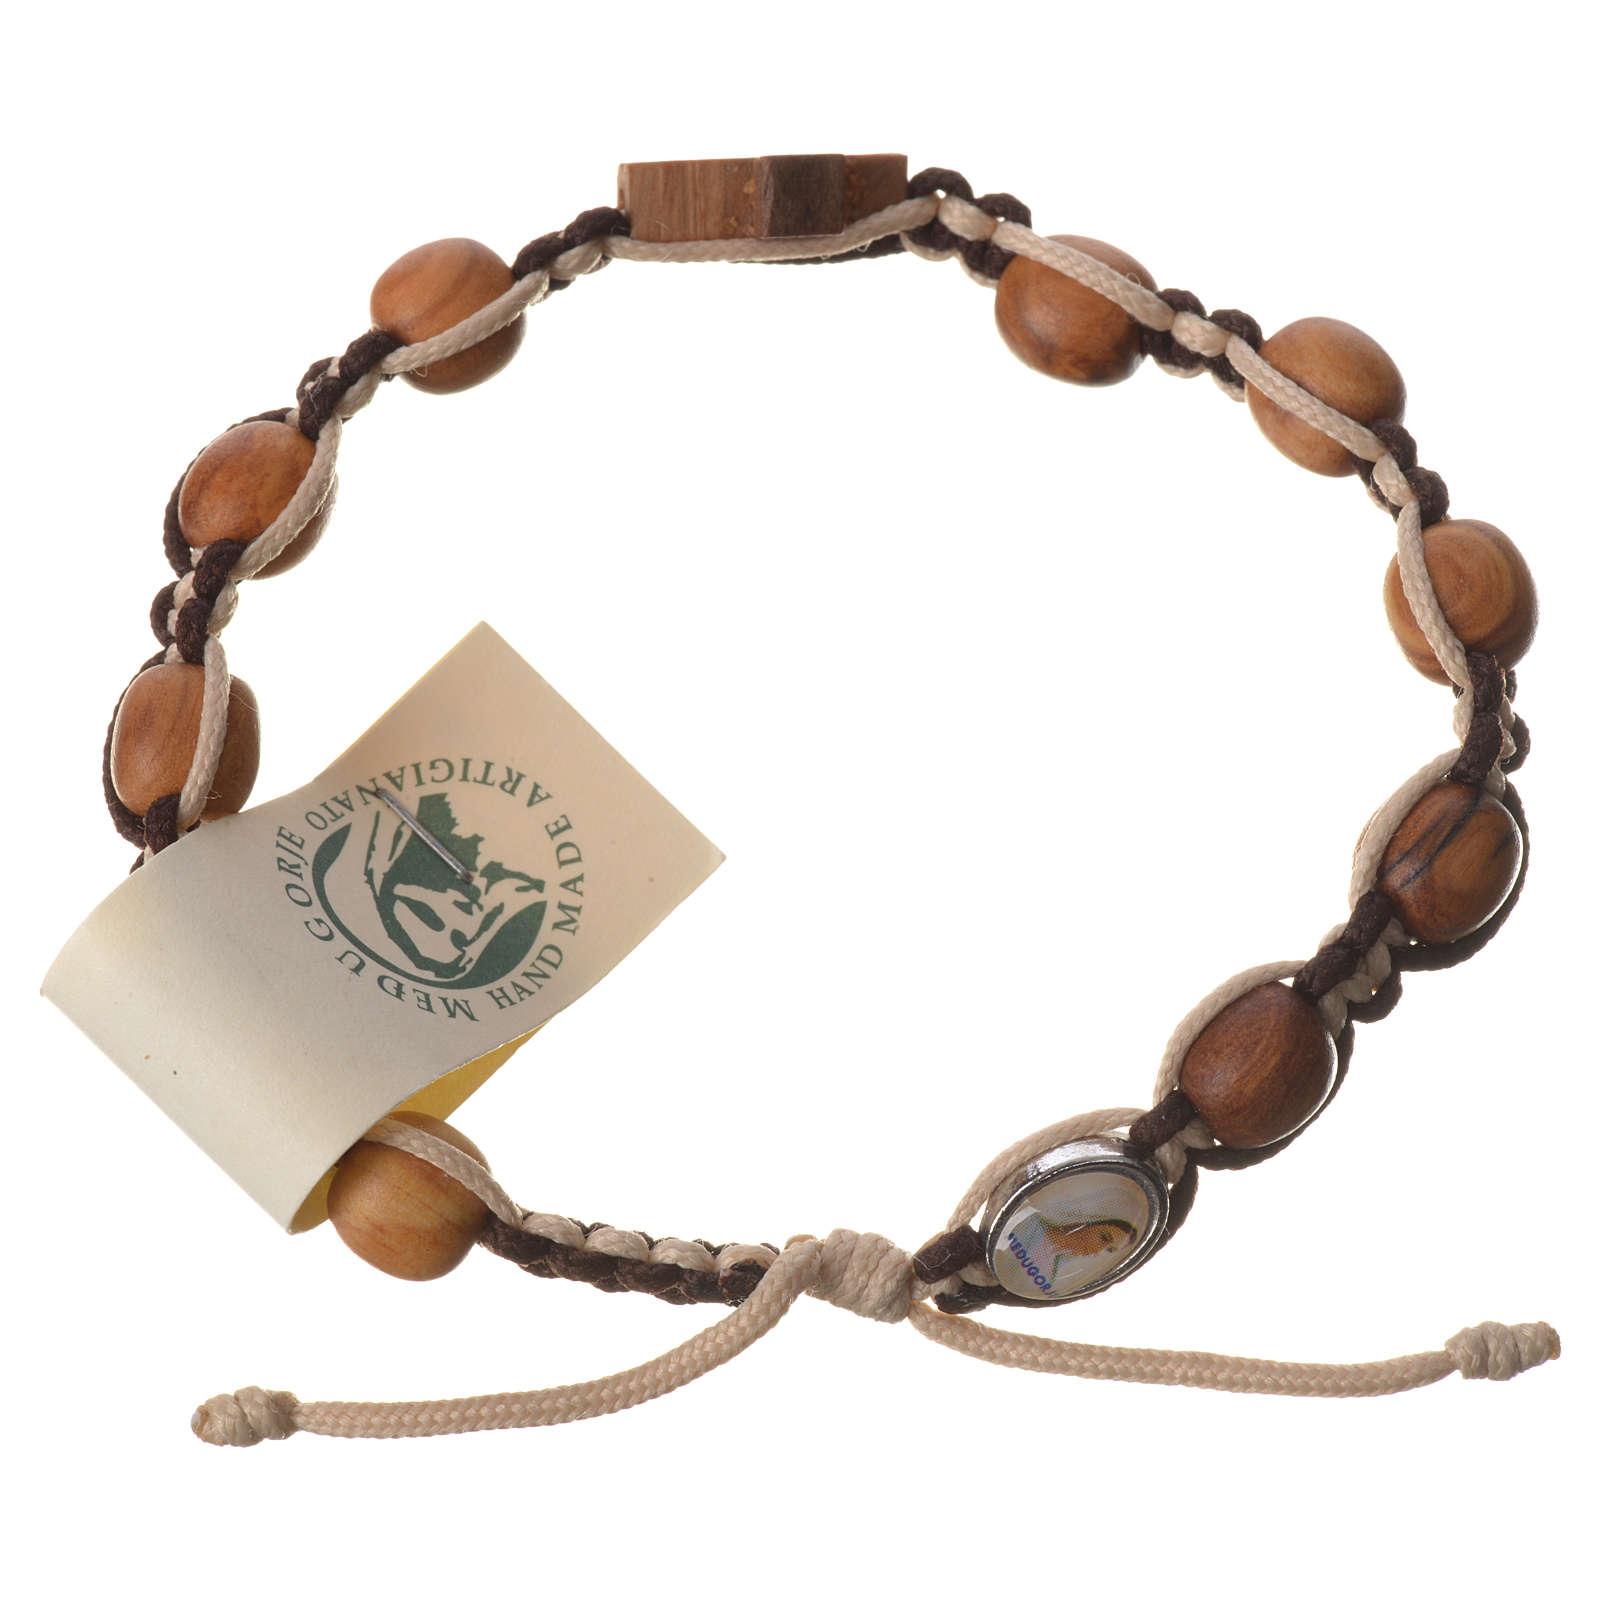 Pulsera Medjugorje cuerda marrón beige cuentas olivo 4